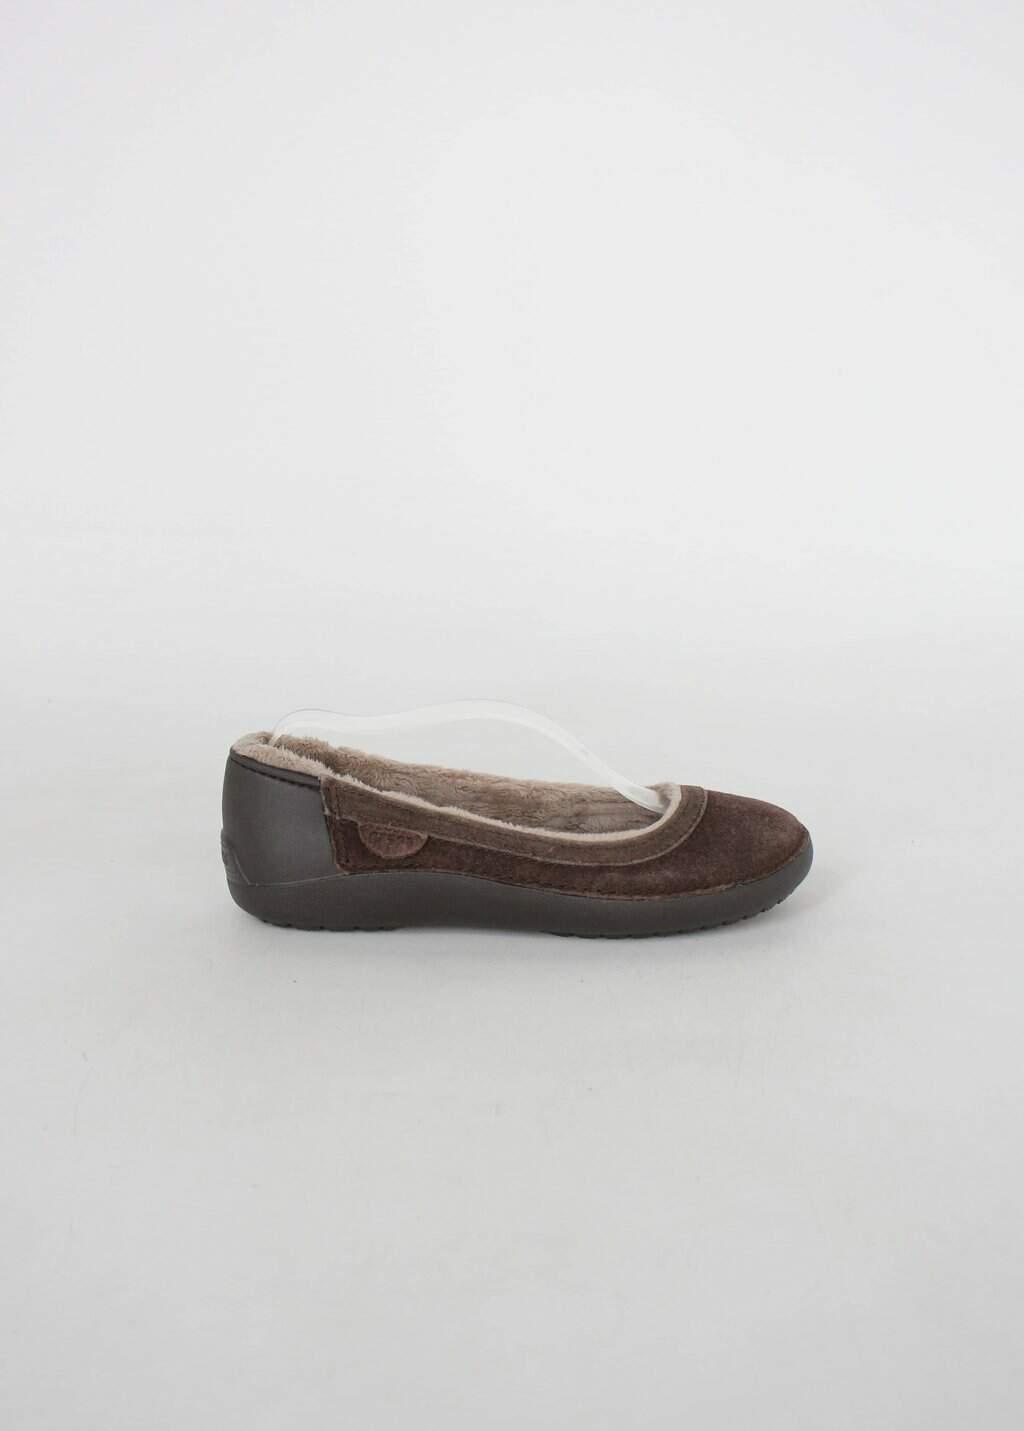 Sapatilha crocs feminina marrom com pelúcia